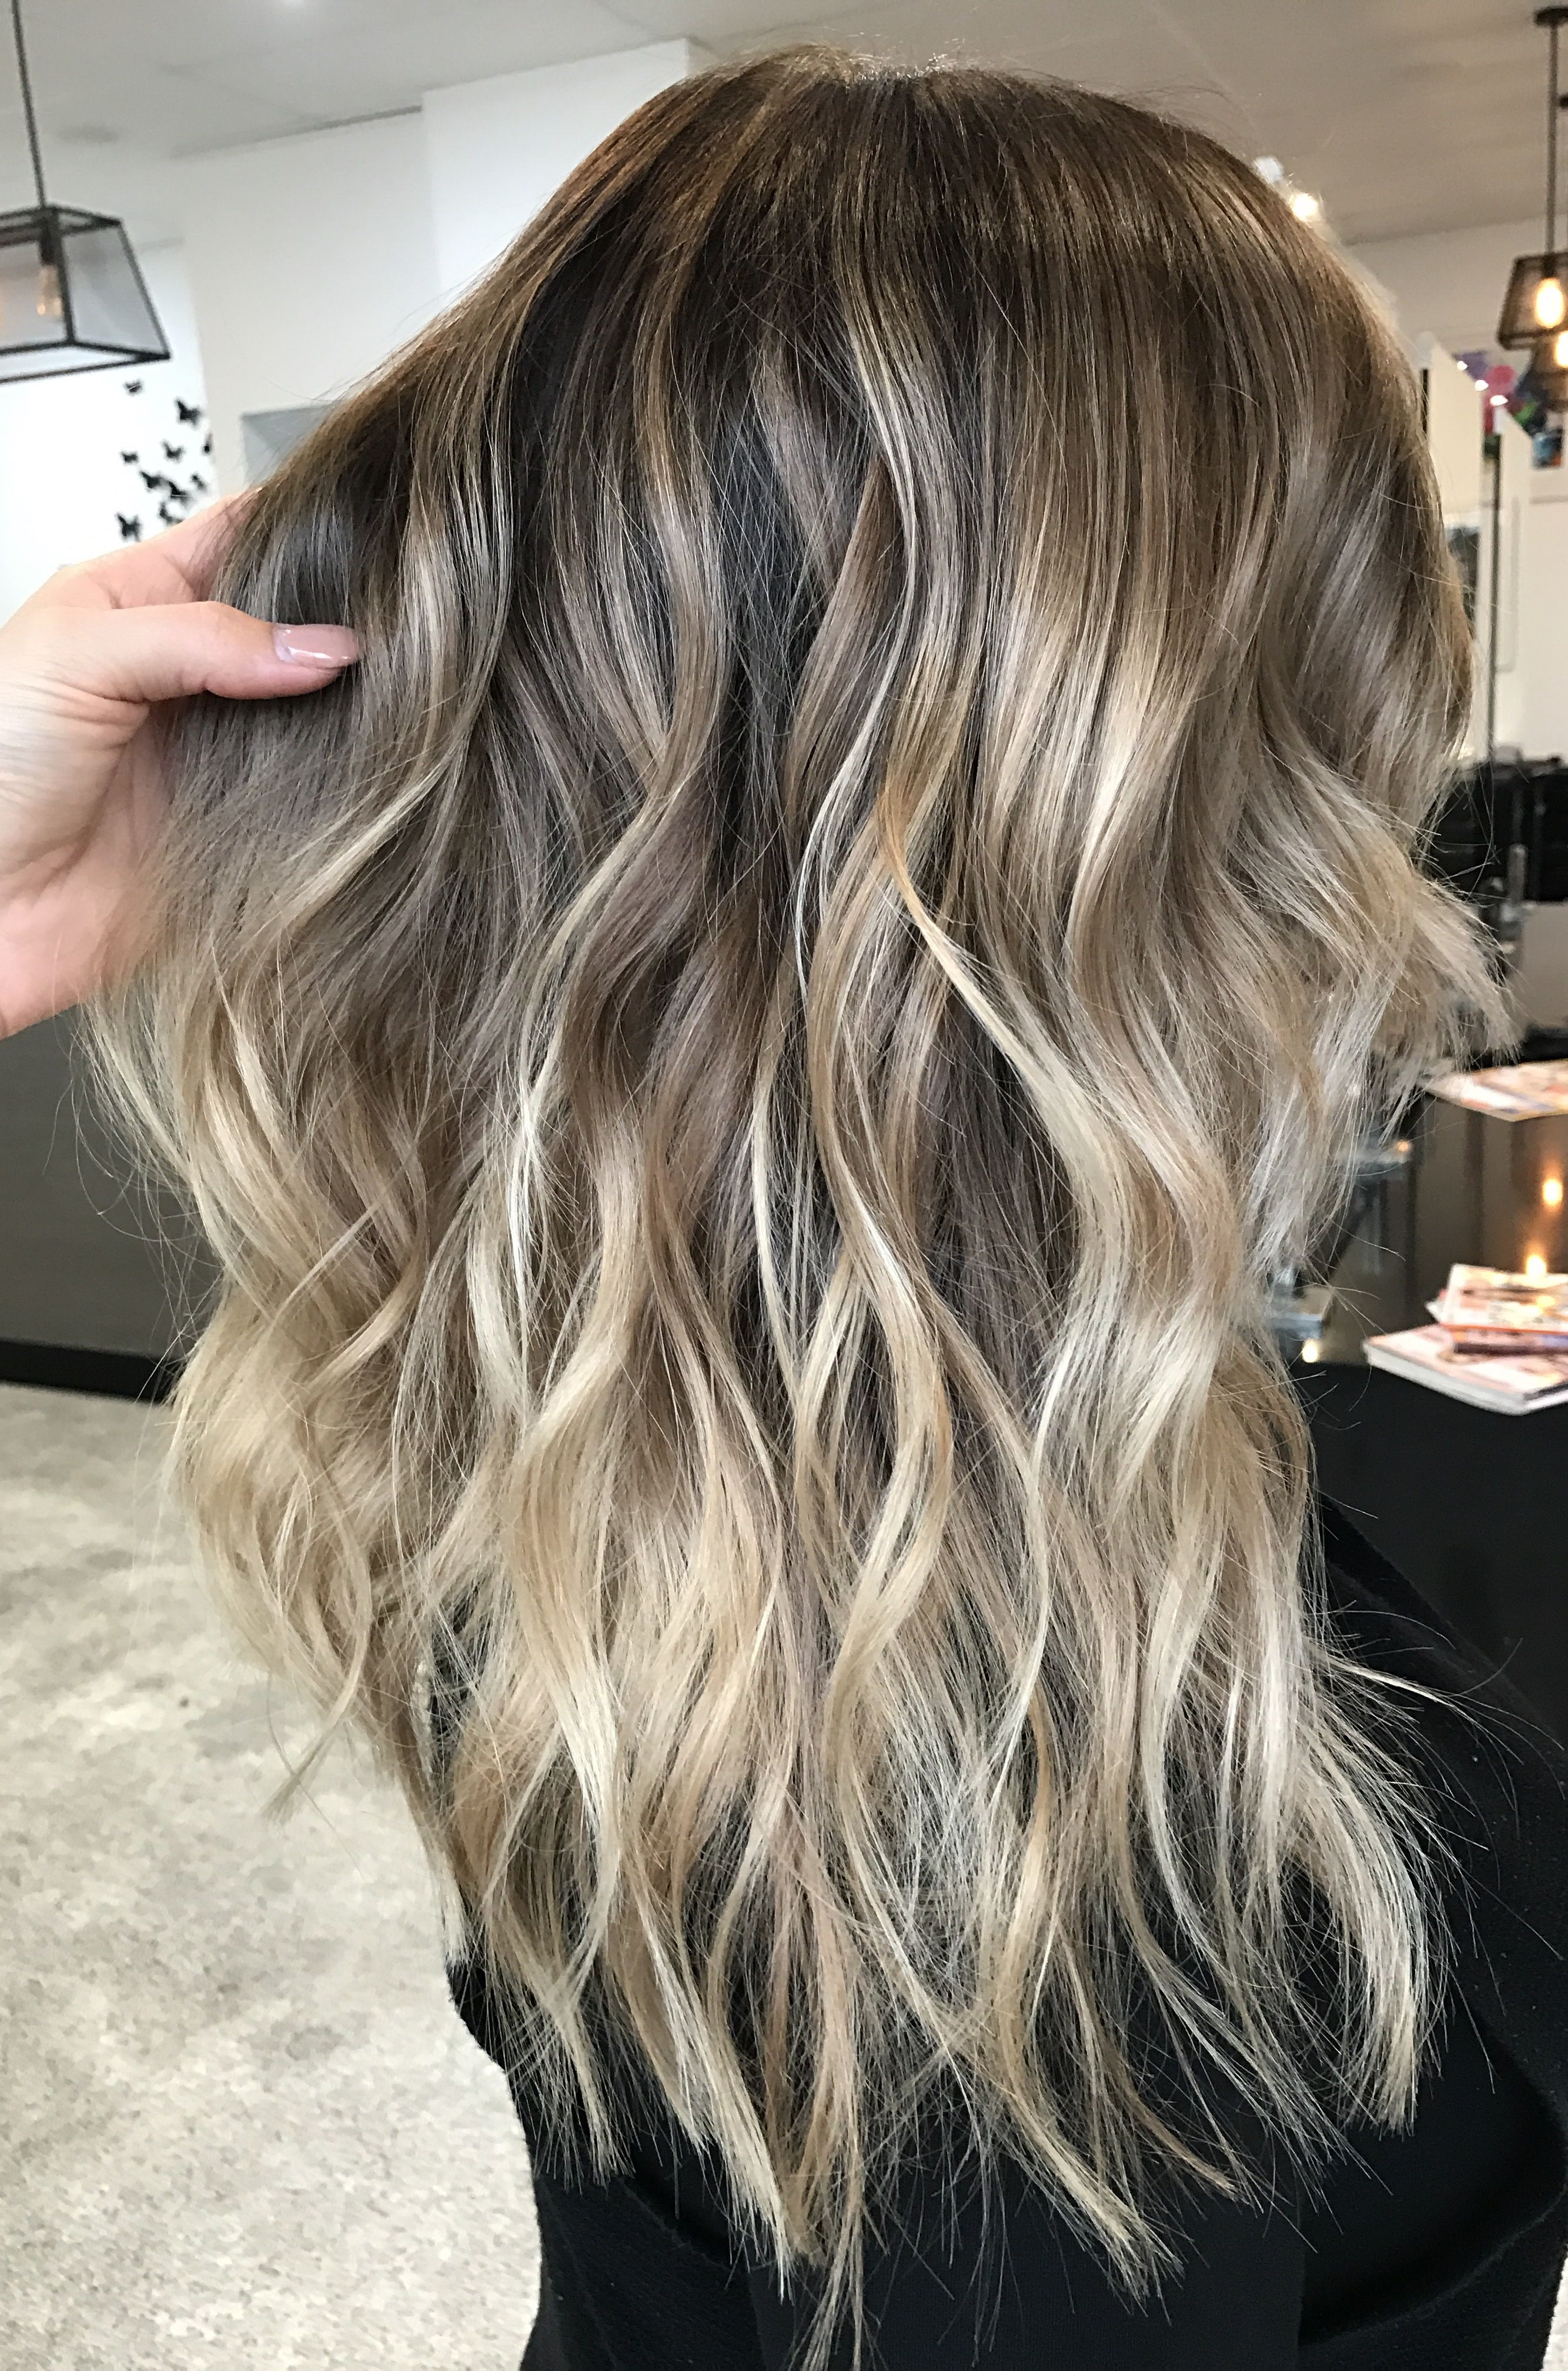 instagram hairbykaitlinjade blonde balayage long hair. Black Bedroom Furniture Sets. Home Design Ideas